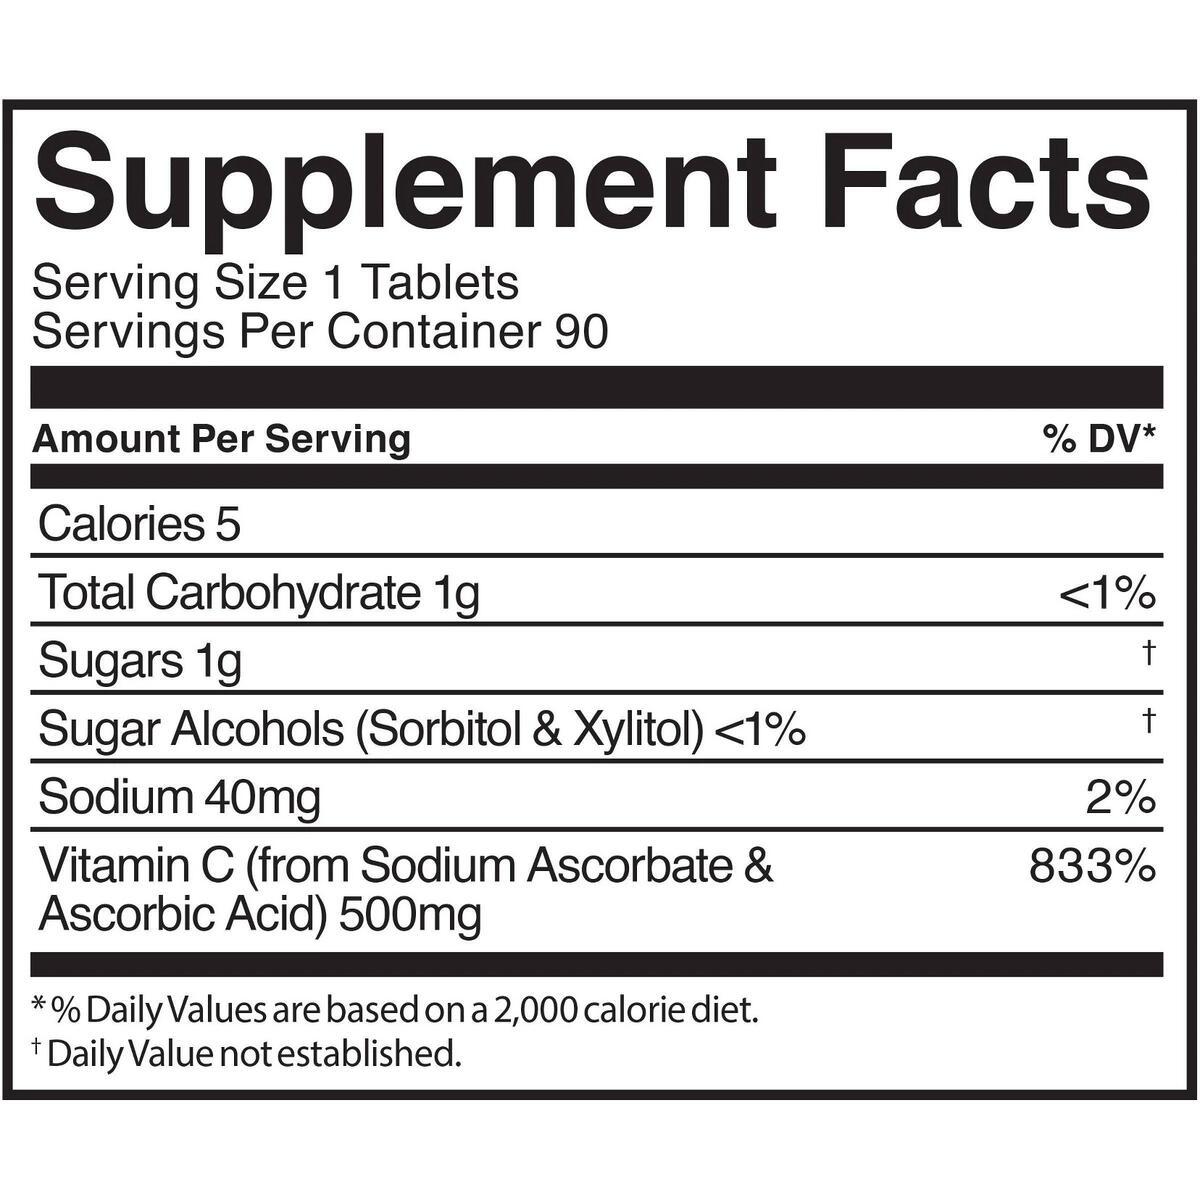 KOS Vitamin C 500mg Chewable Tablets - 90ct